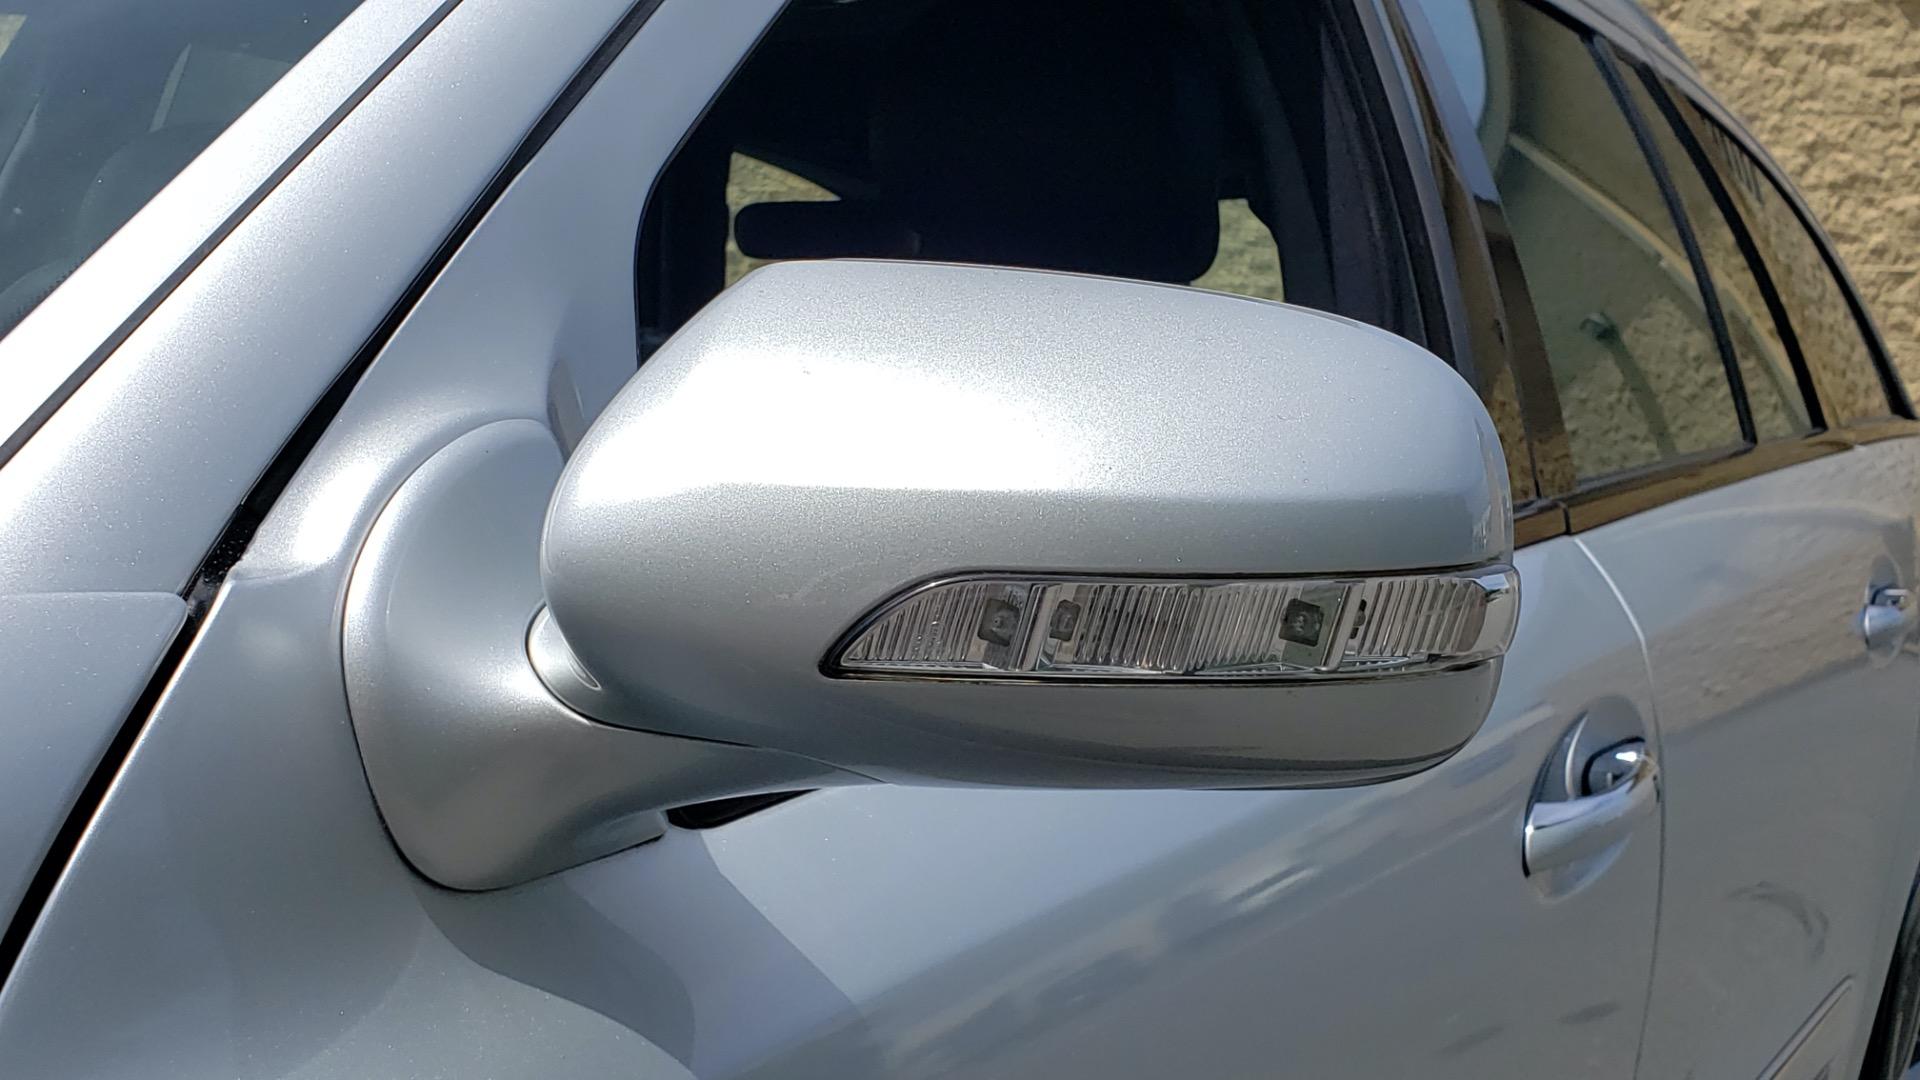 Used 2007 Mercedes-Benz E-Class E63 AMG WAGON / NAV / SUNROOF / HARMAN/KARDON for sale $29,000 at Formula Imports in Charlotte NC 28227 37